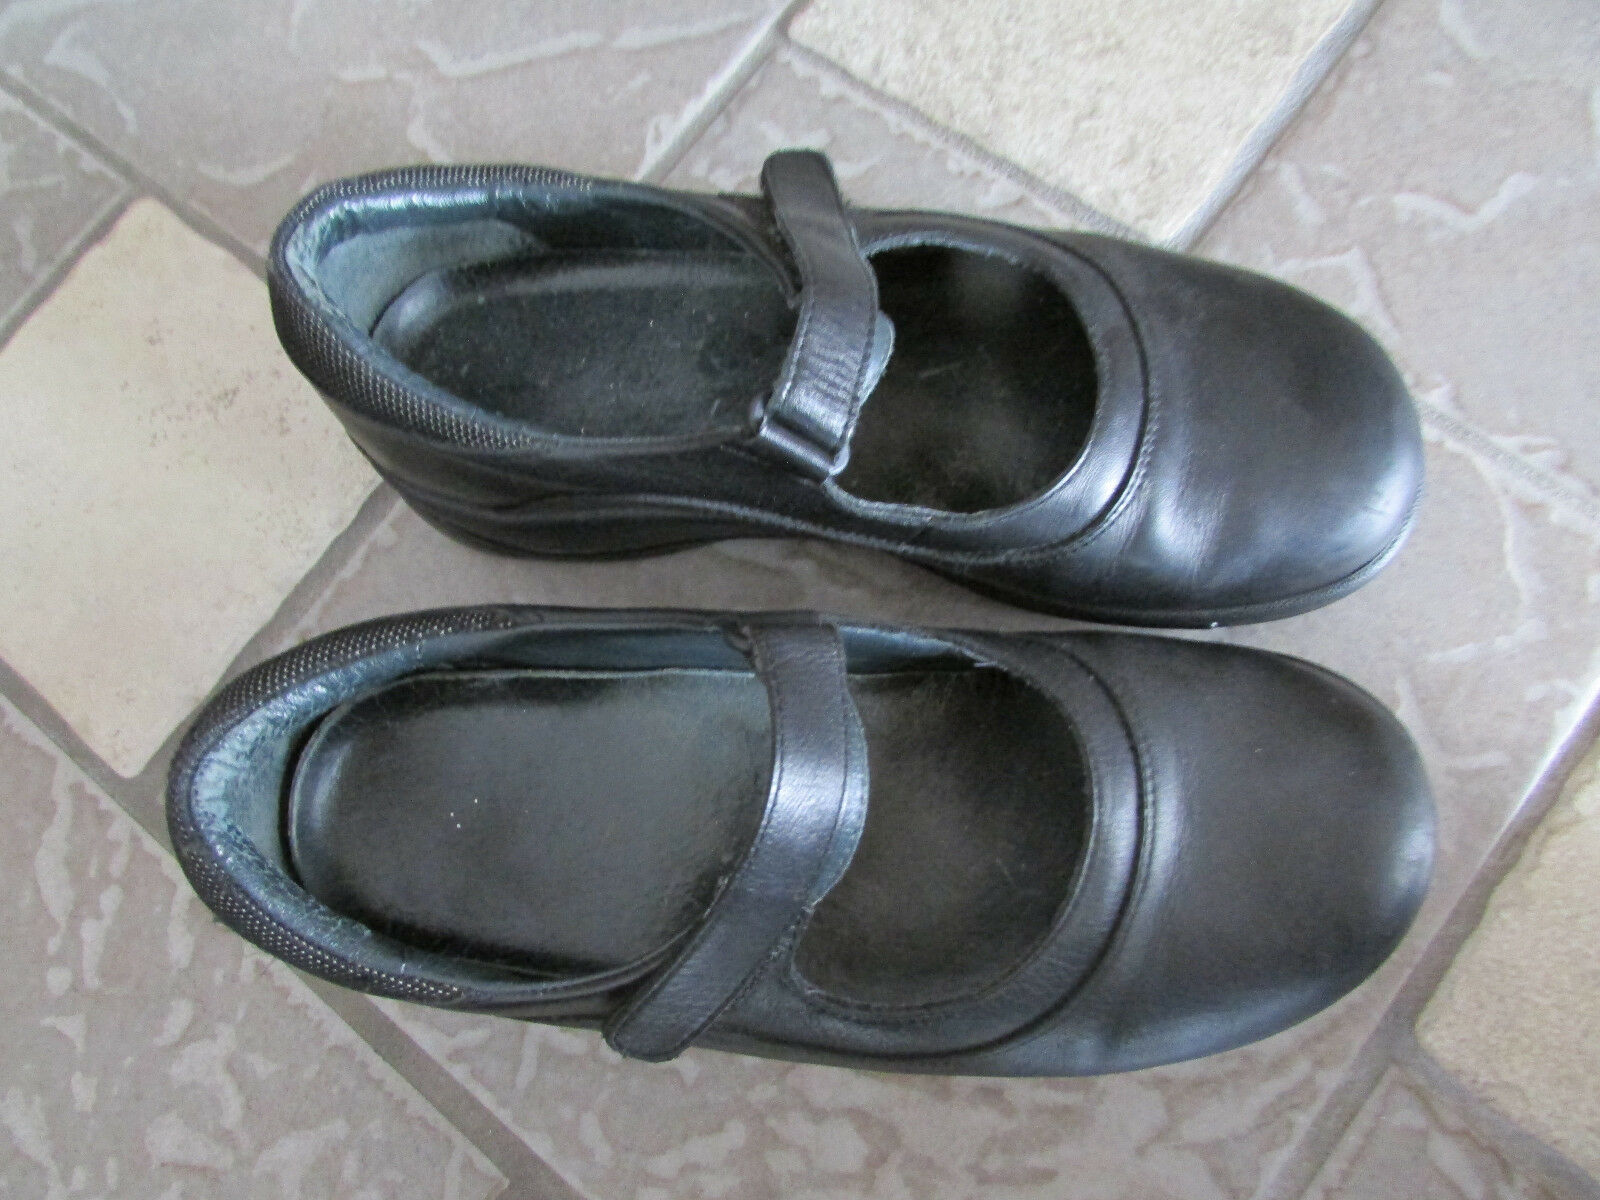 Dansko noir Mocassins chaussures Femme 40 9.5-10 Leather Mary Janes Free Ship